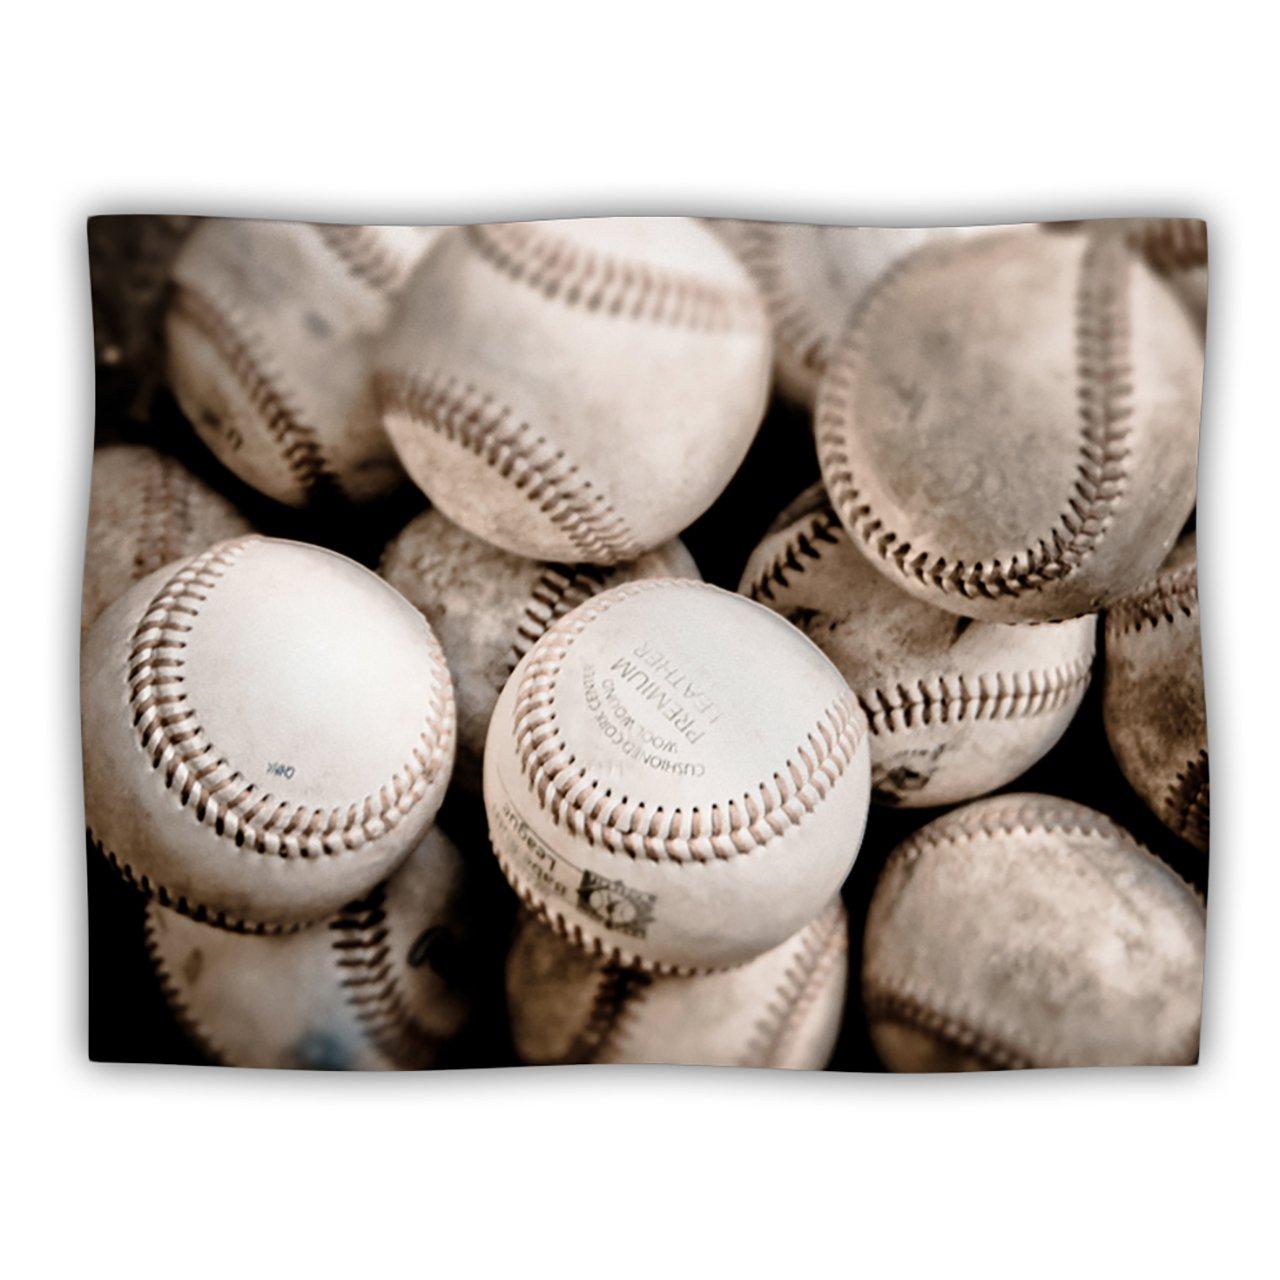 Kess InHouse Debbra Obertanec ''On The Mound'' Baseball Pet Blanket, 40 by 30-Inch